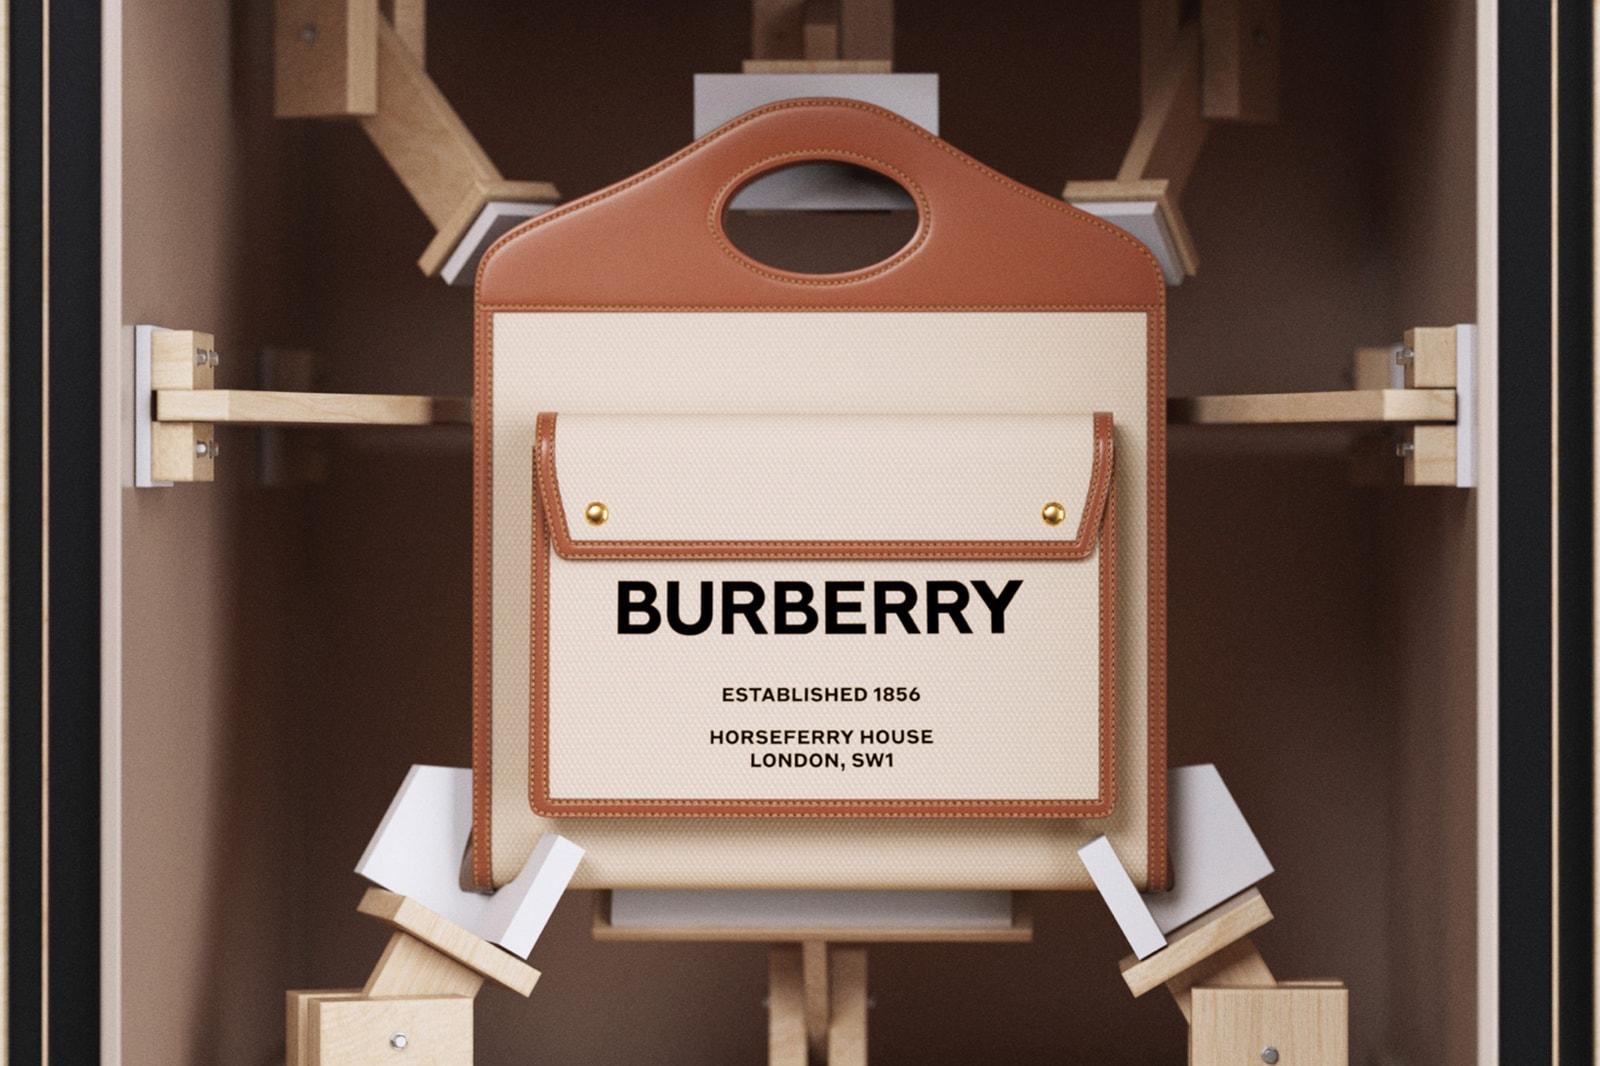 burberry pocket bag bella hadid campaign inez and vinoodh monogram canvas designer purses